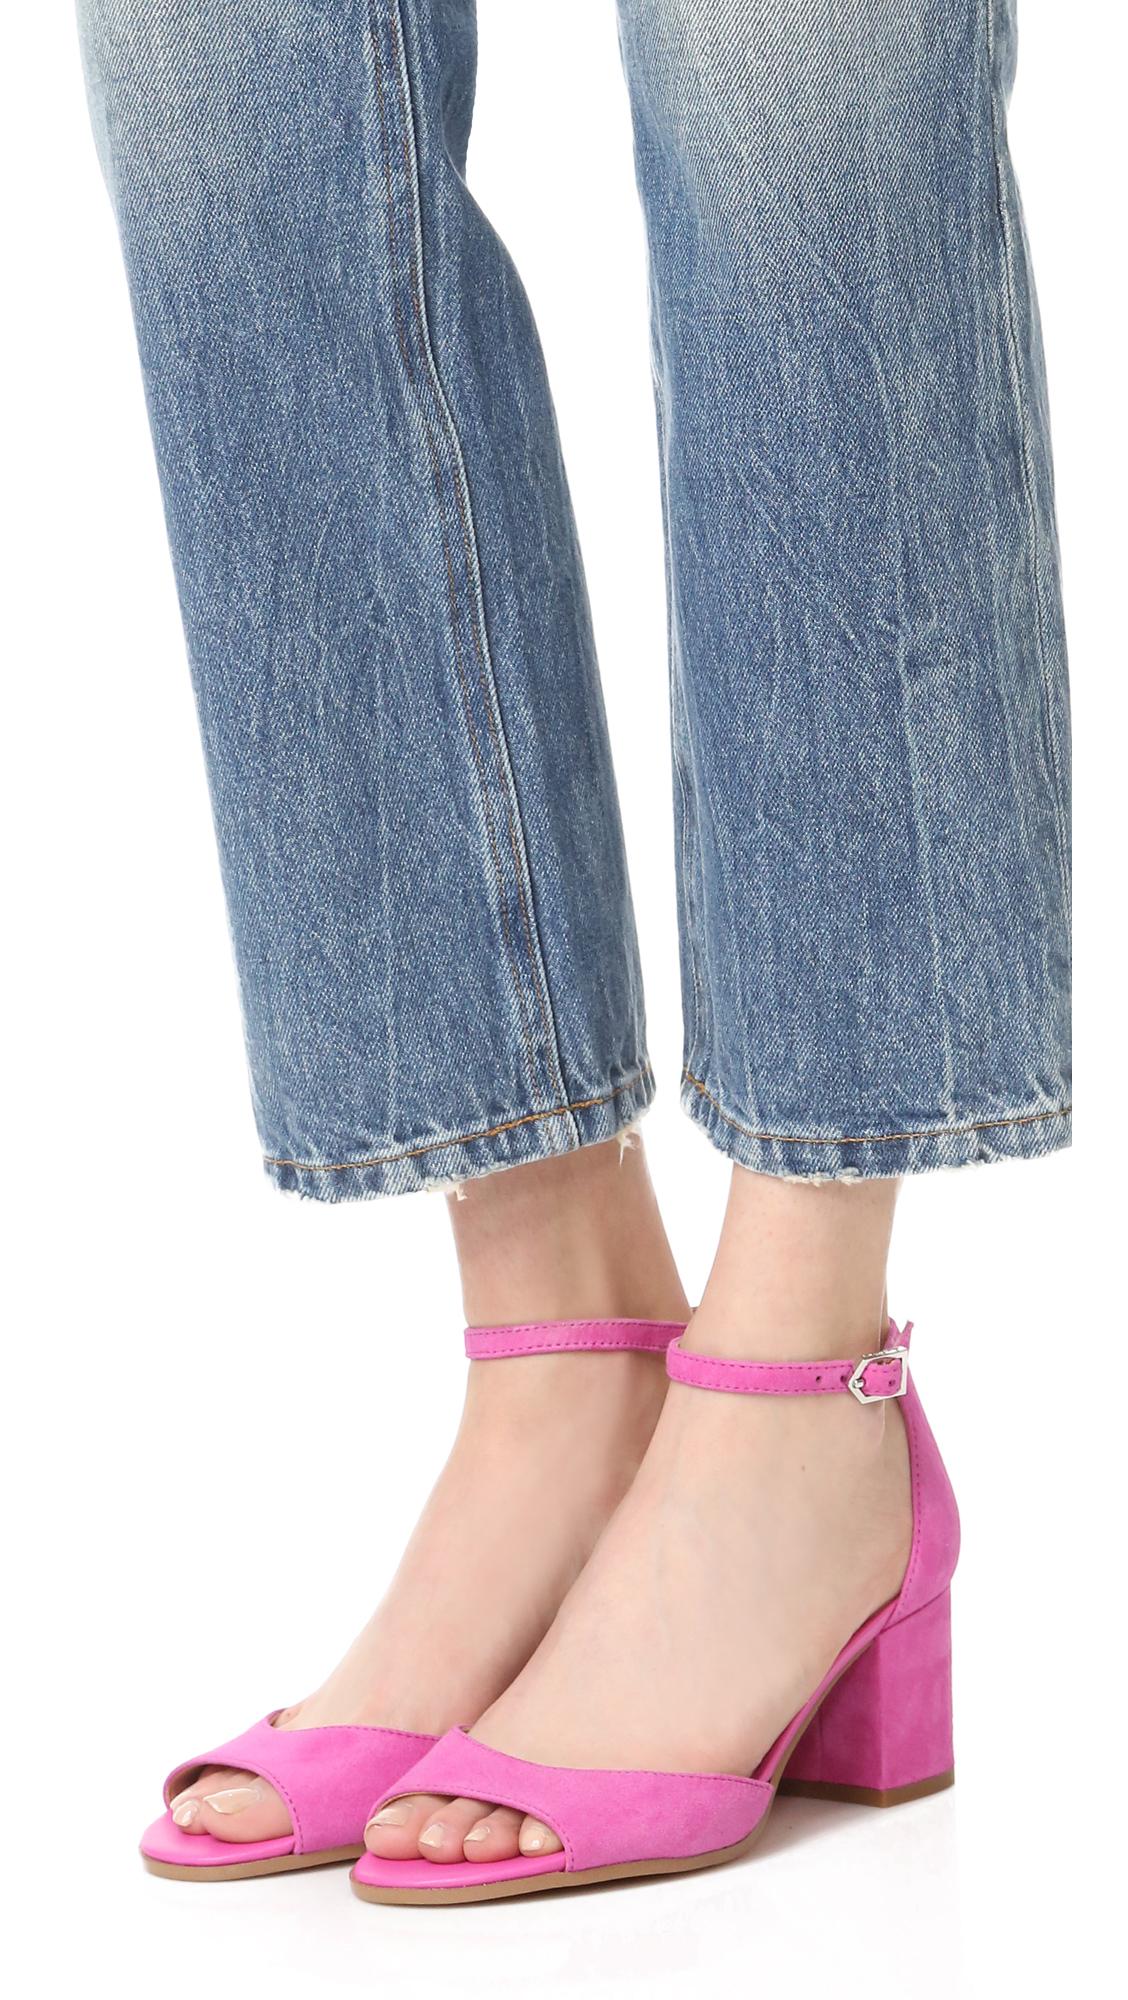 b32226096165ea Sam Edelman Susie City Sandals